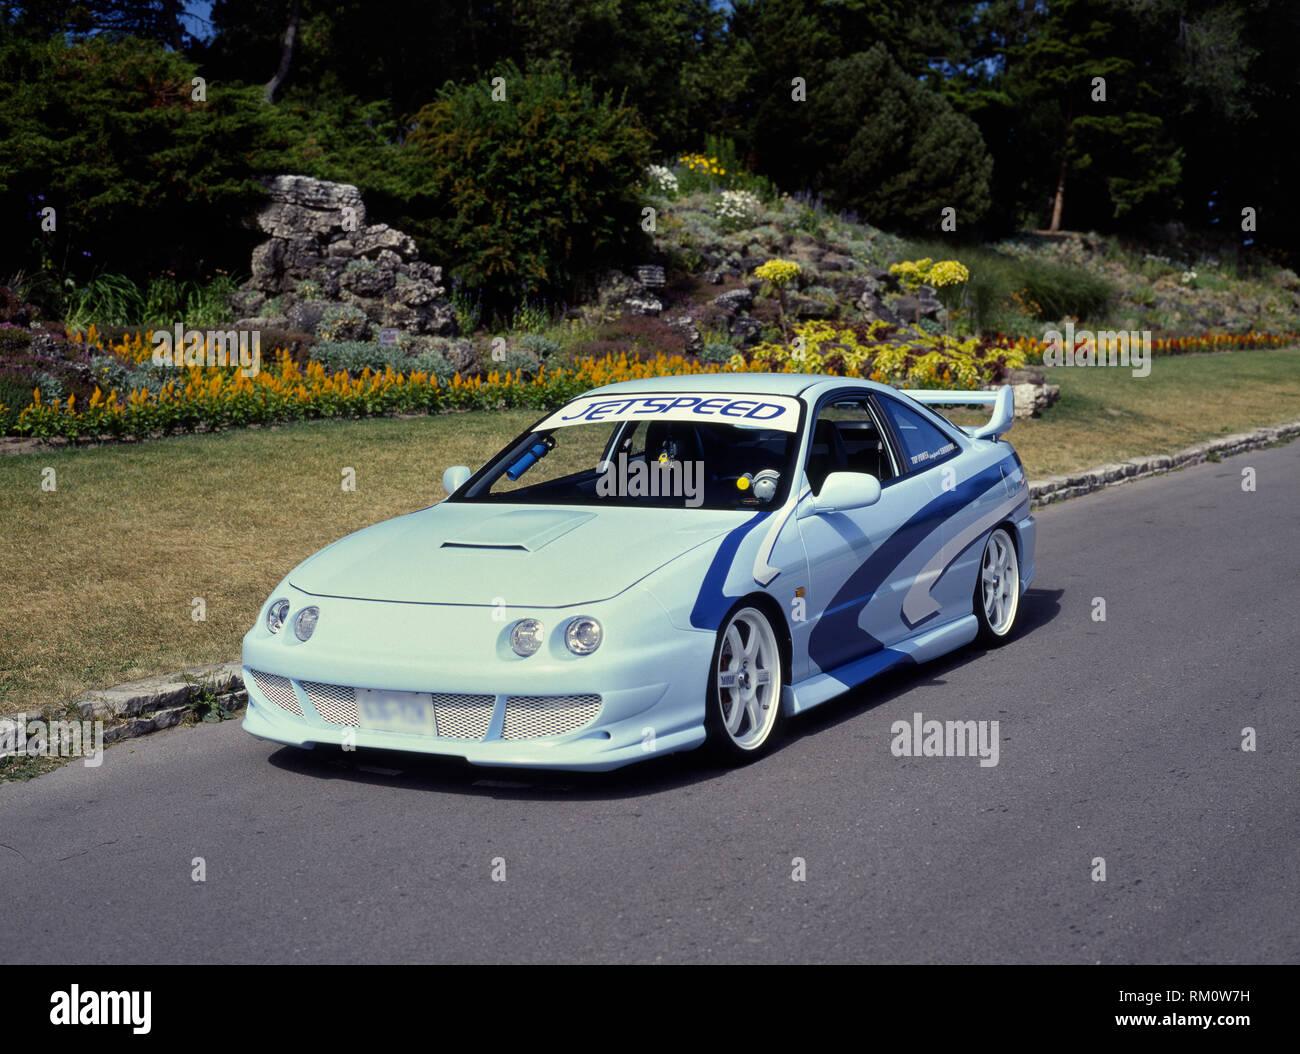 1995 Acura Integra Rs Stock Photo Alamy